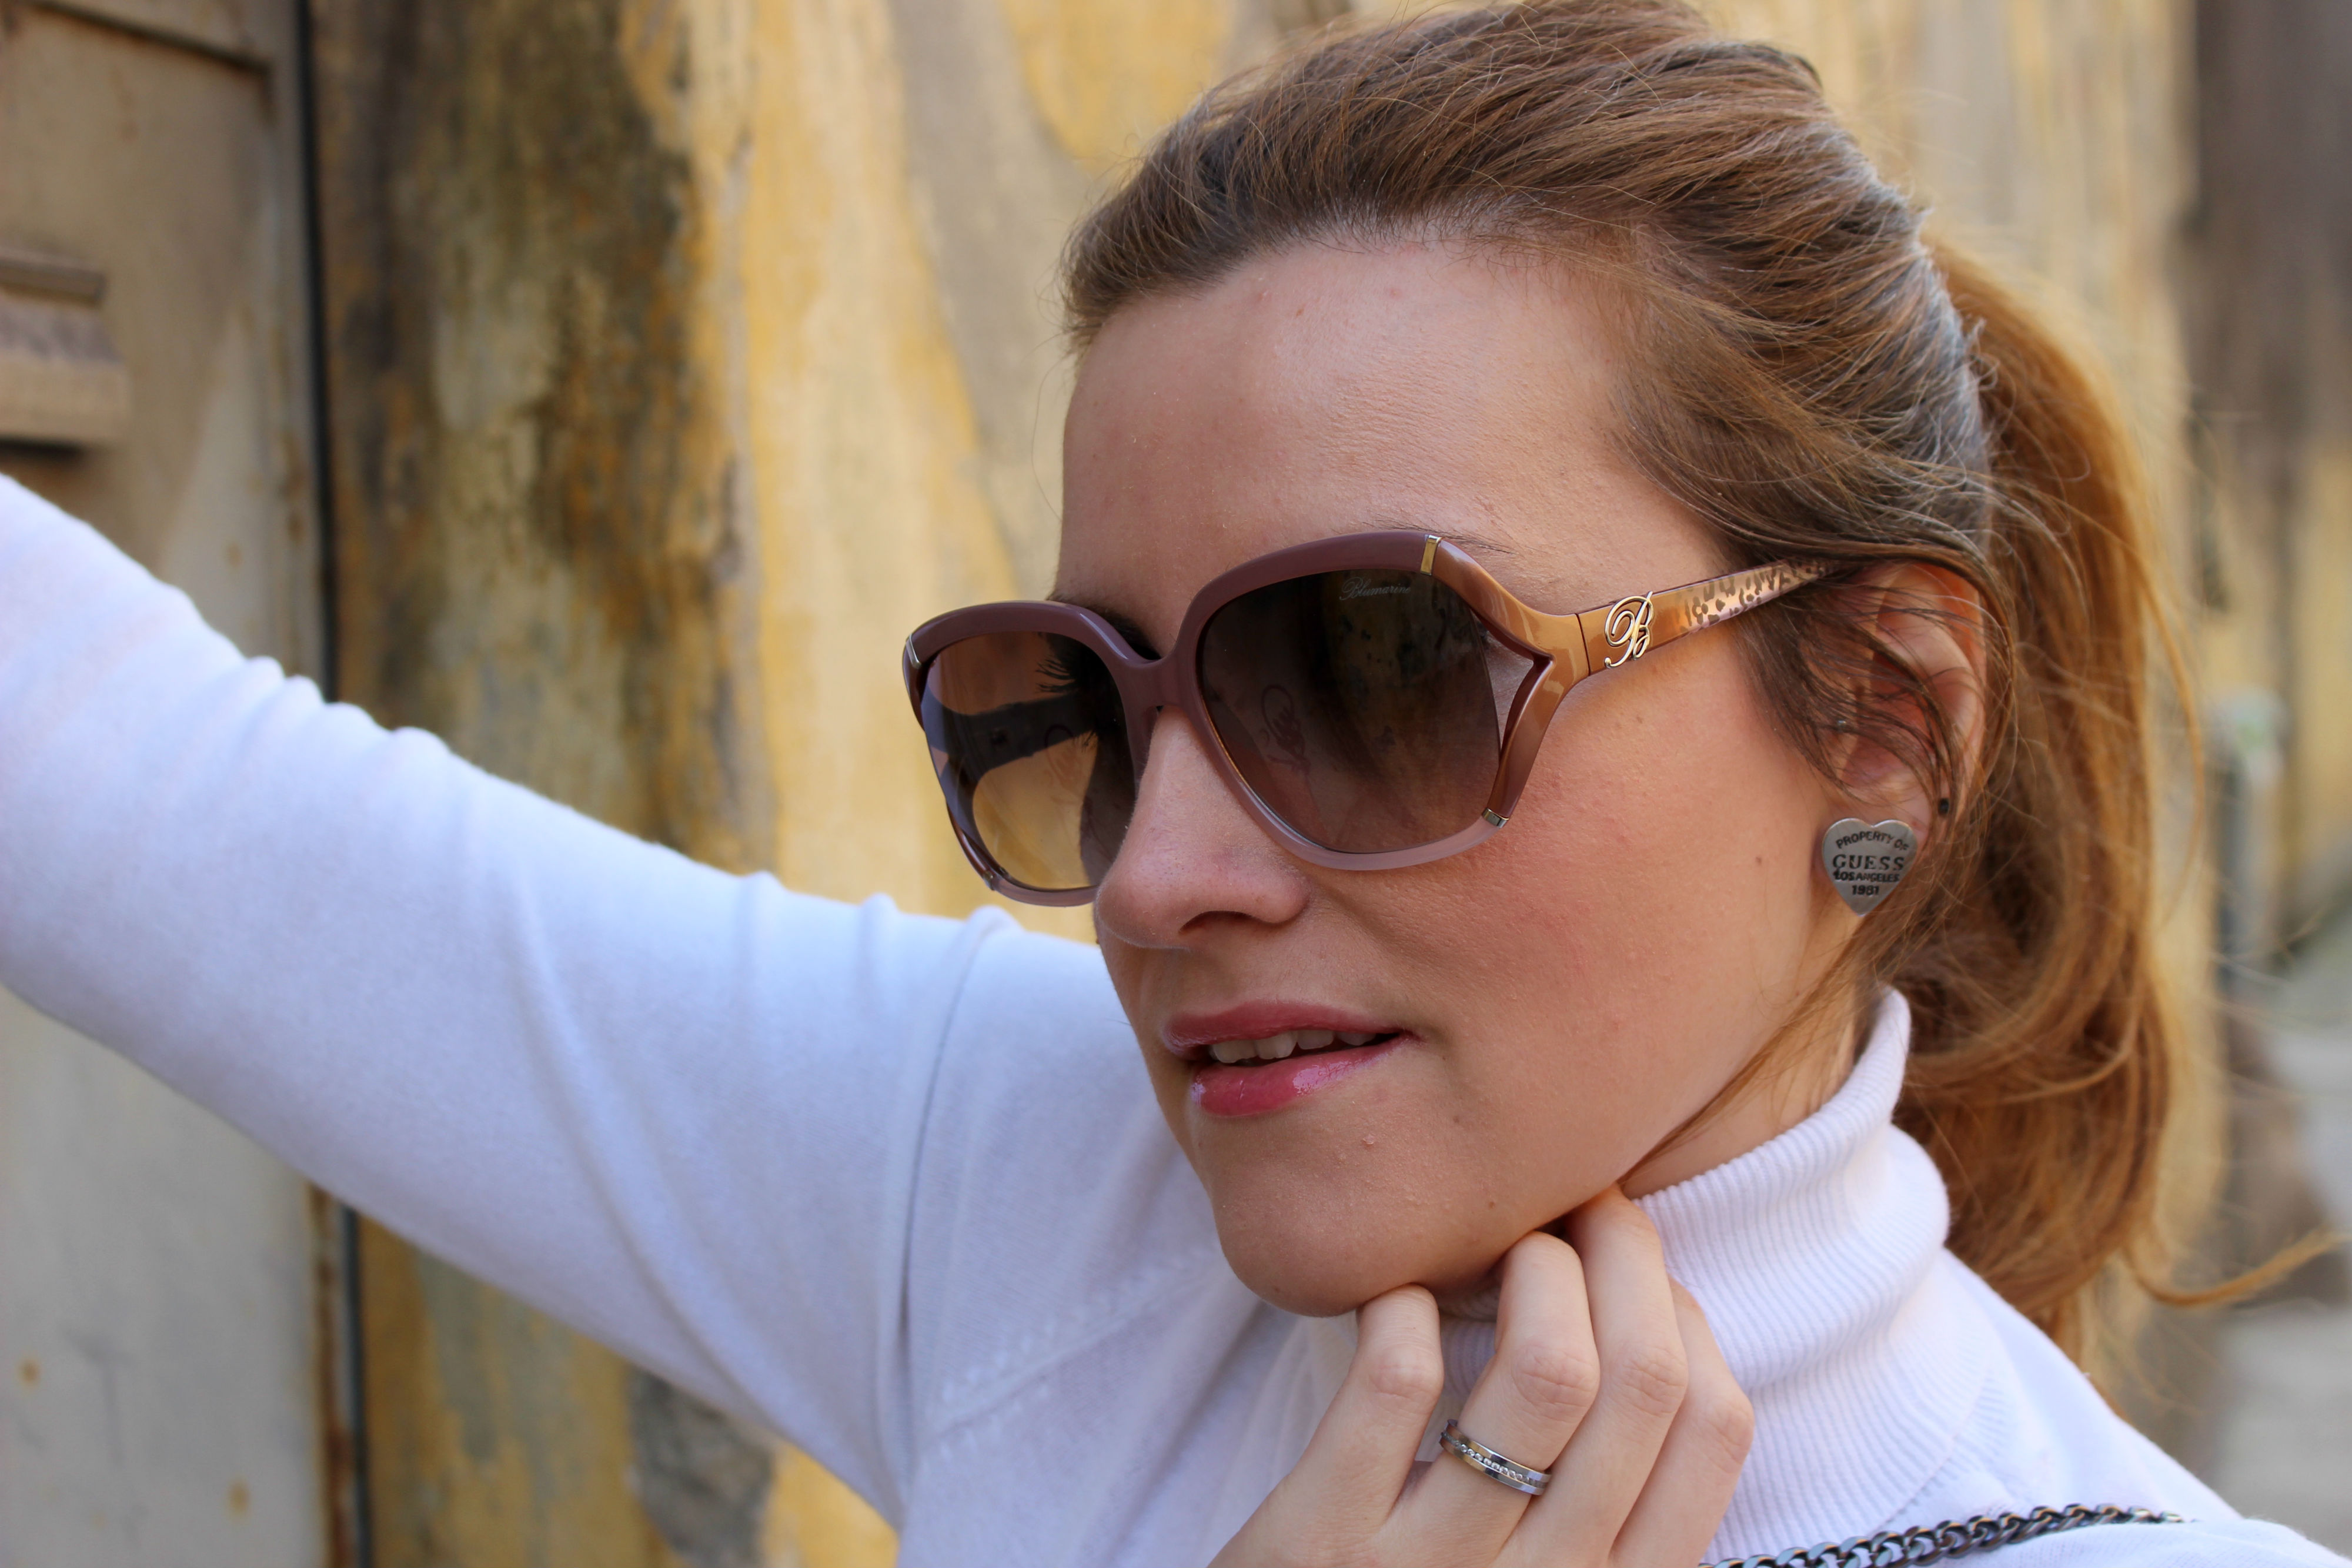 DESIGUAL-EBARRITO-S'AGAPò-ELISABETTABERTOLINI-ANIMALIER-LOOK.blumarine-sunglasses-giarre.com